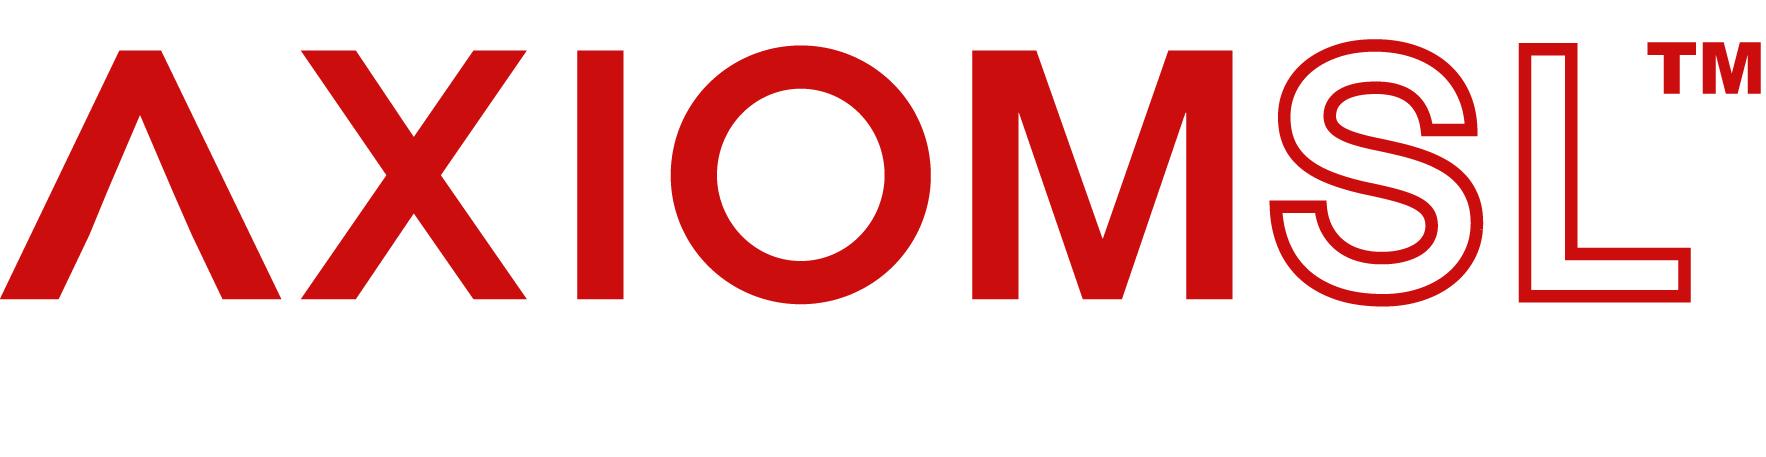 AxiomSL Welcomes Ken Lamar to Board of Advisors